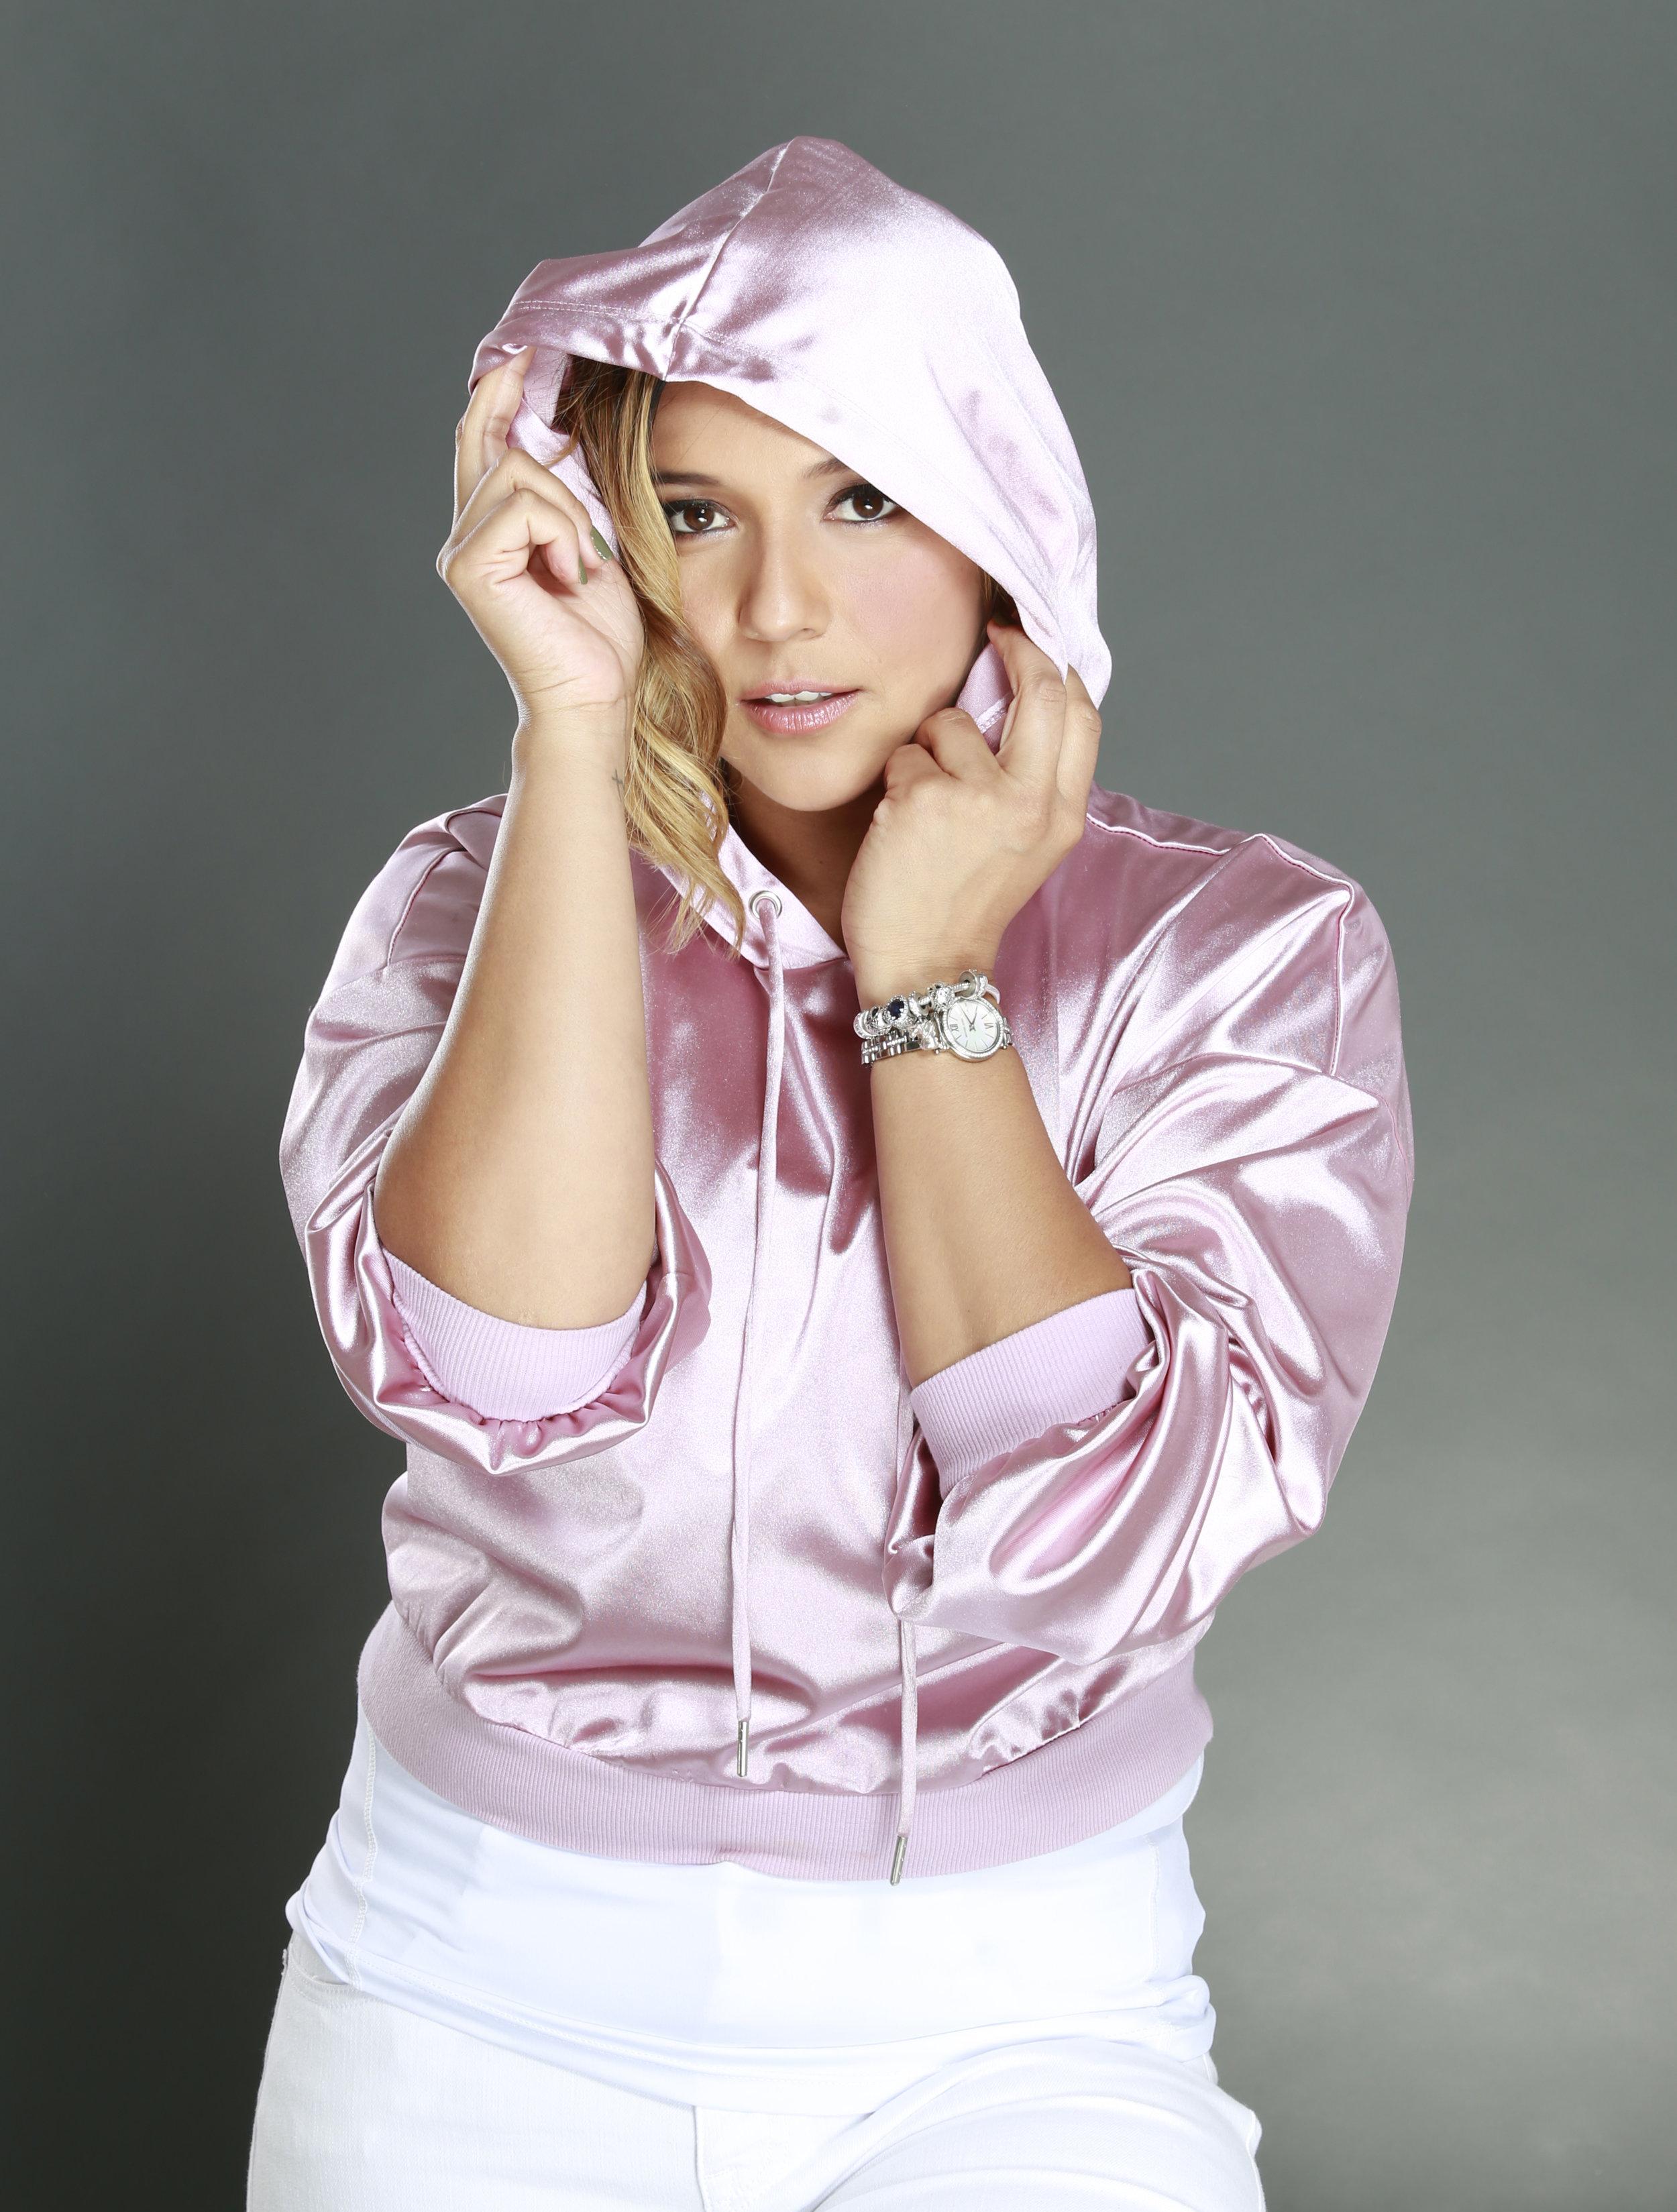 Reyna Franco - Radio & TV personalityMotivational SpeakerPrint ModelVoiceoverPodcasterInfluencerBloggerHost